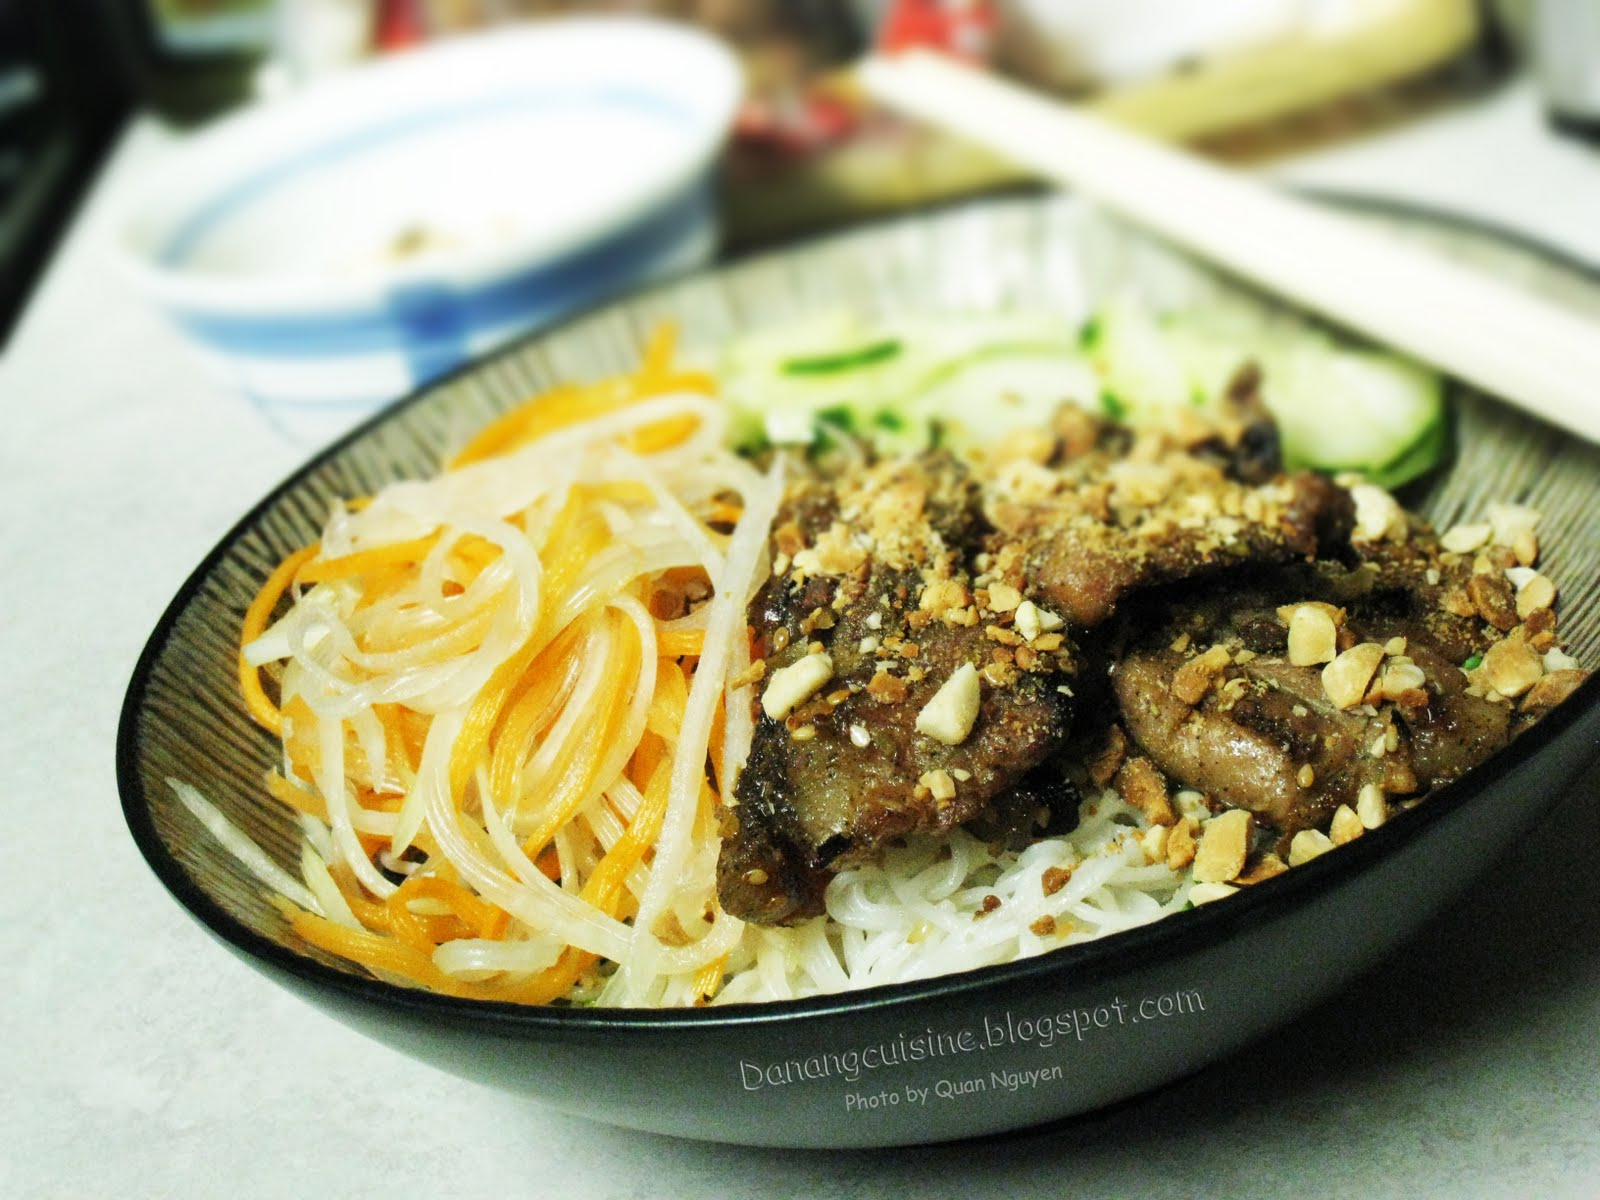 Recipe: Danang Style grilled pork noodle salad – Bun thit